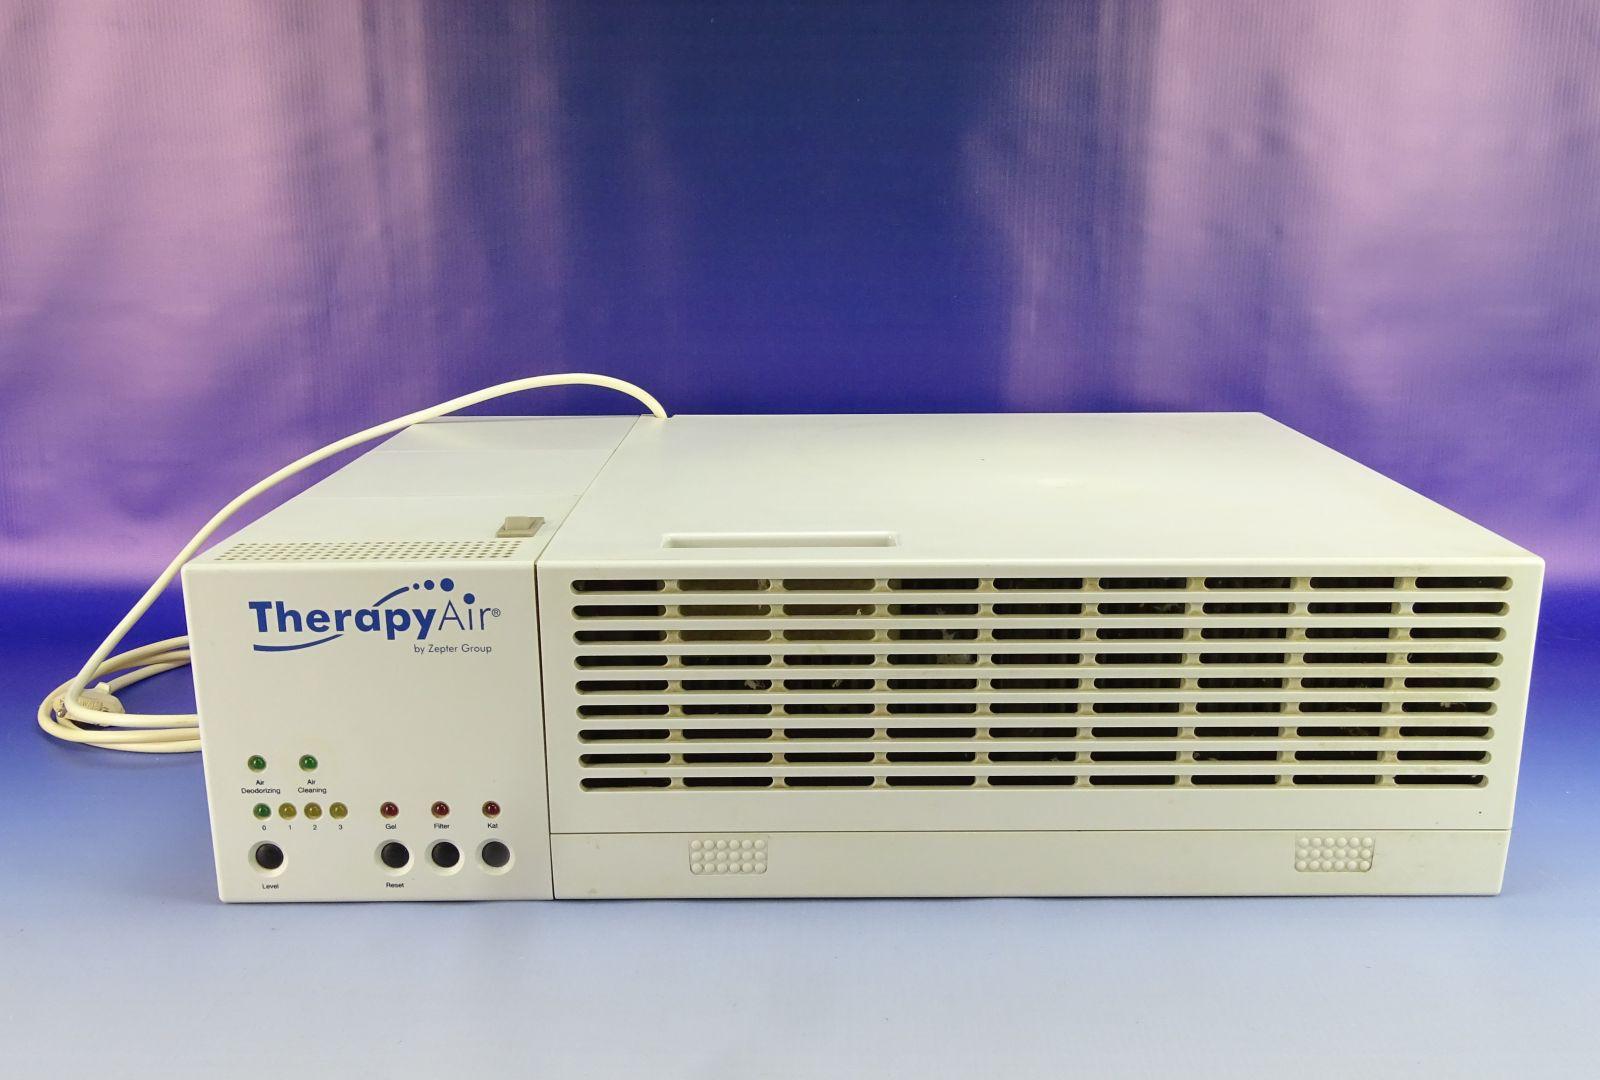 DSC04120.JPG (1600×1080)